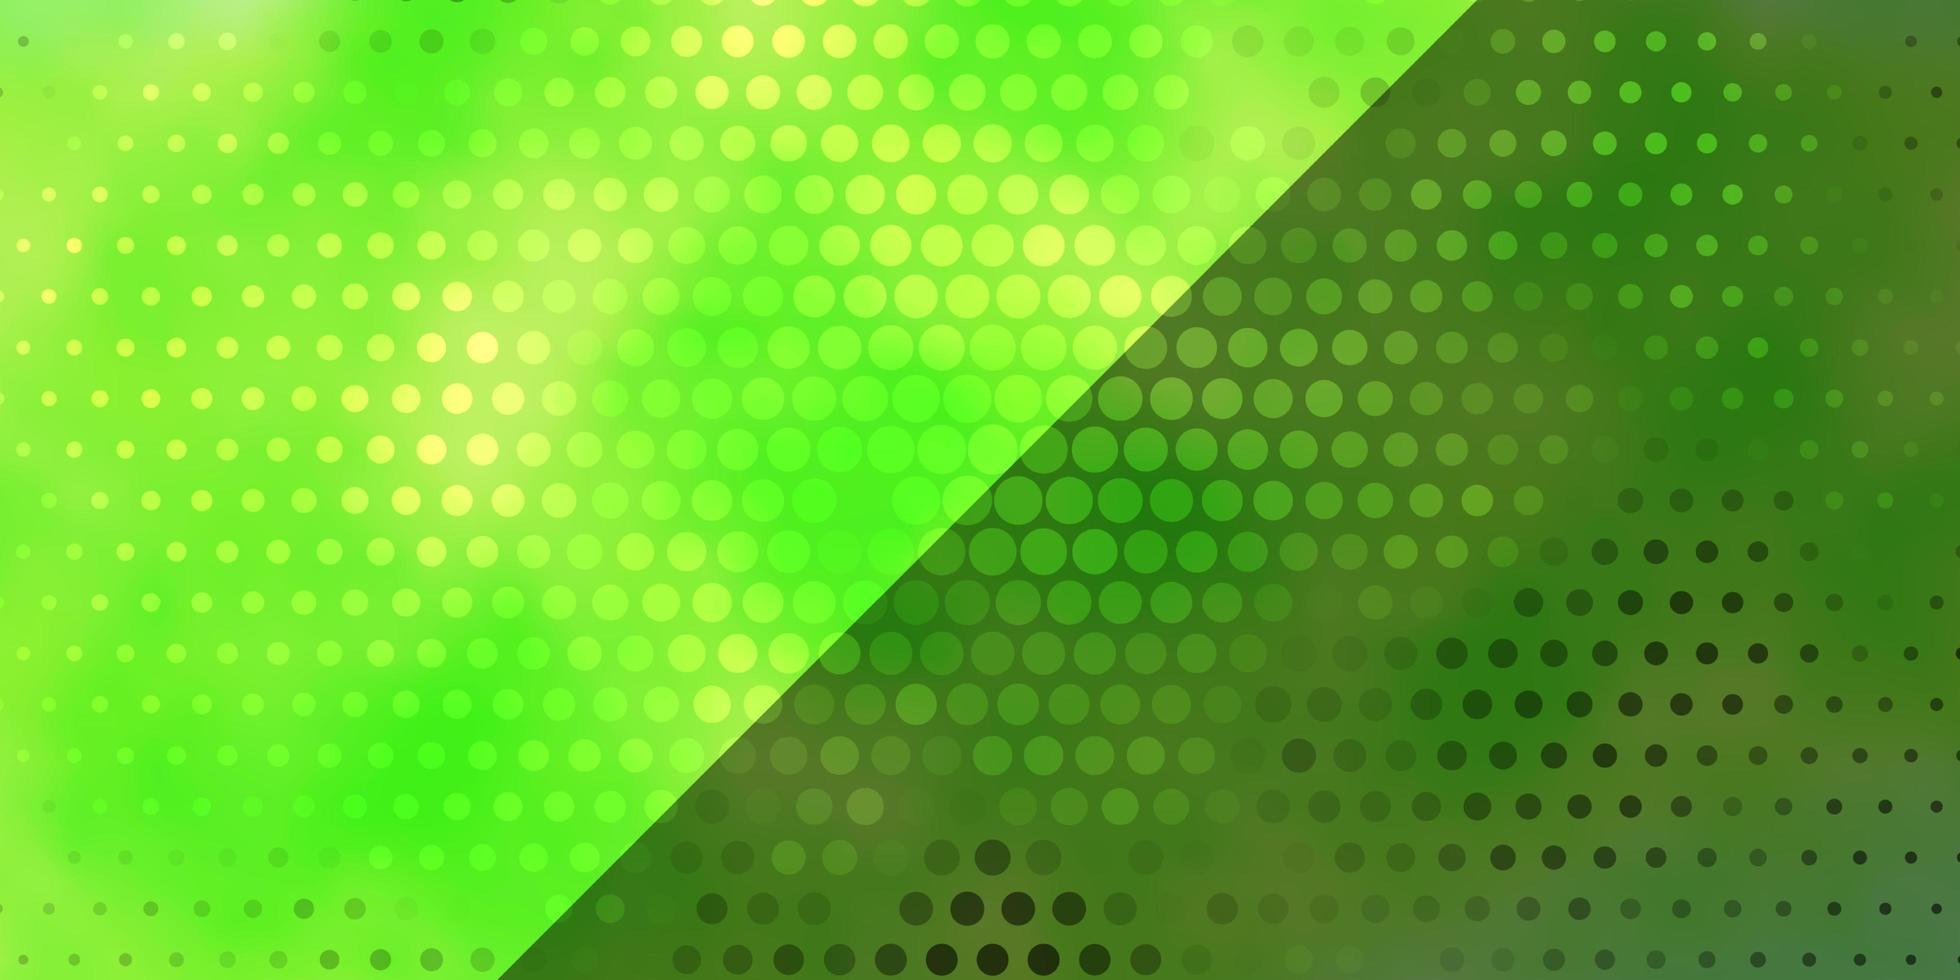 modelo de vetor verde claro com círculos.